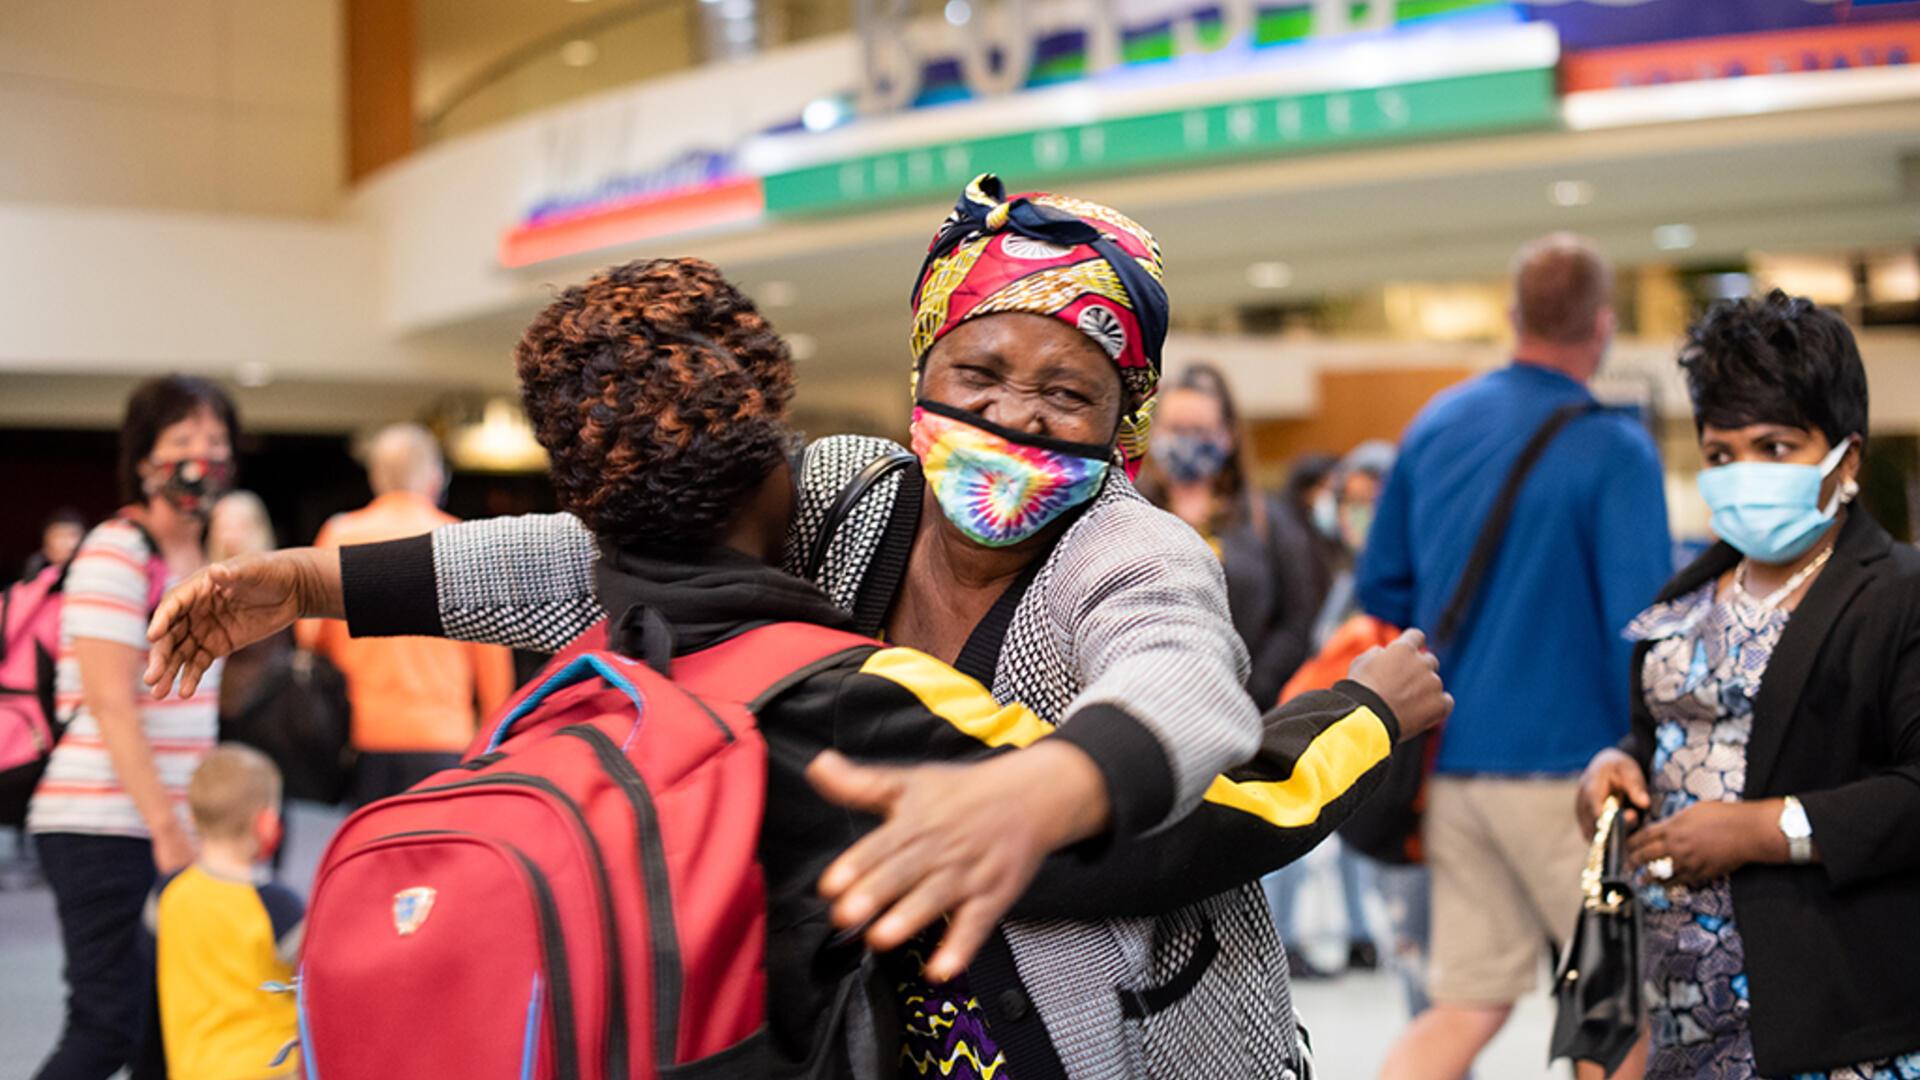 Wanyema Mitambo, wearing a mask, hugs her grandchild in the Boise Airport